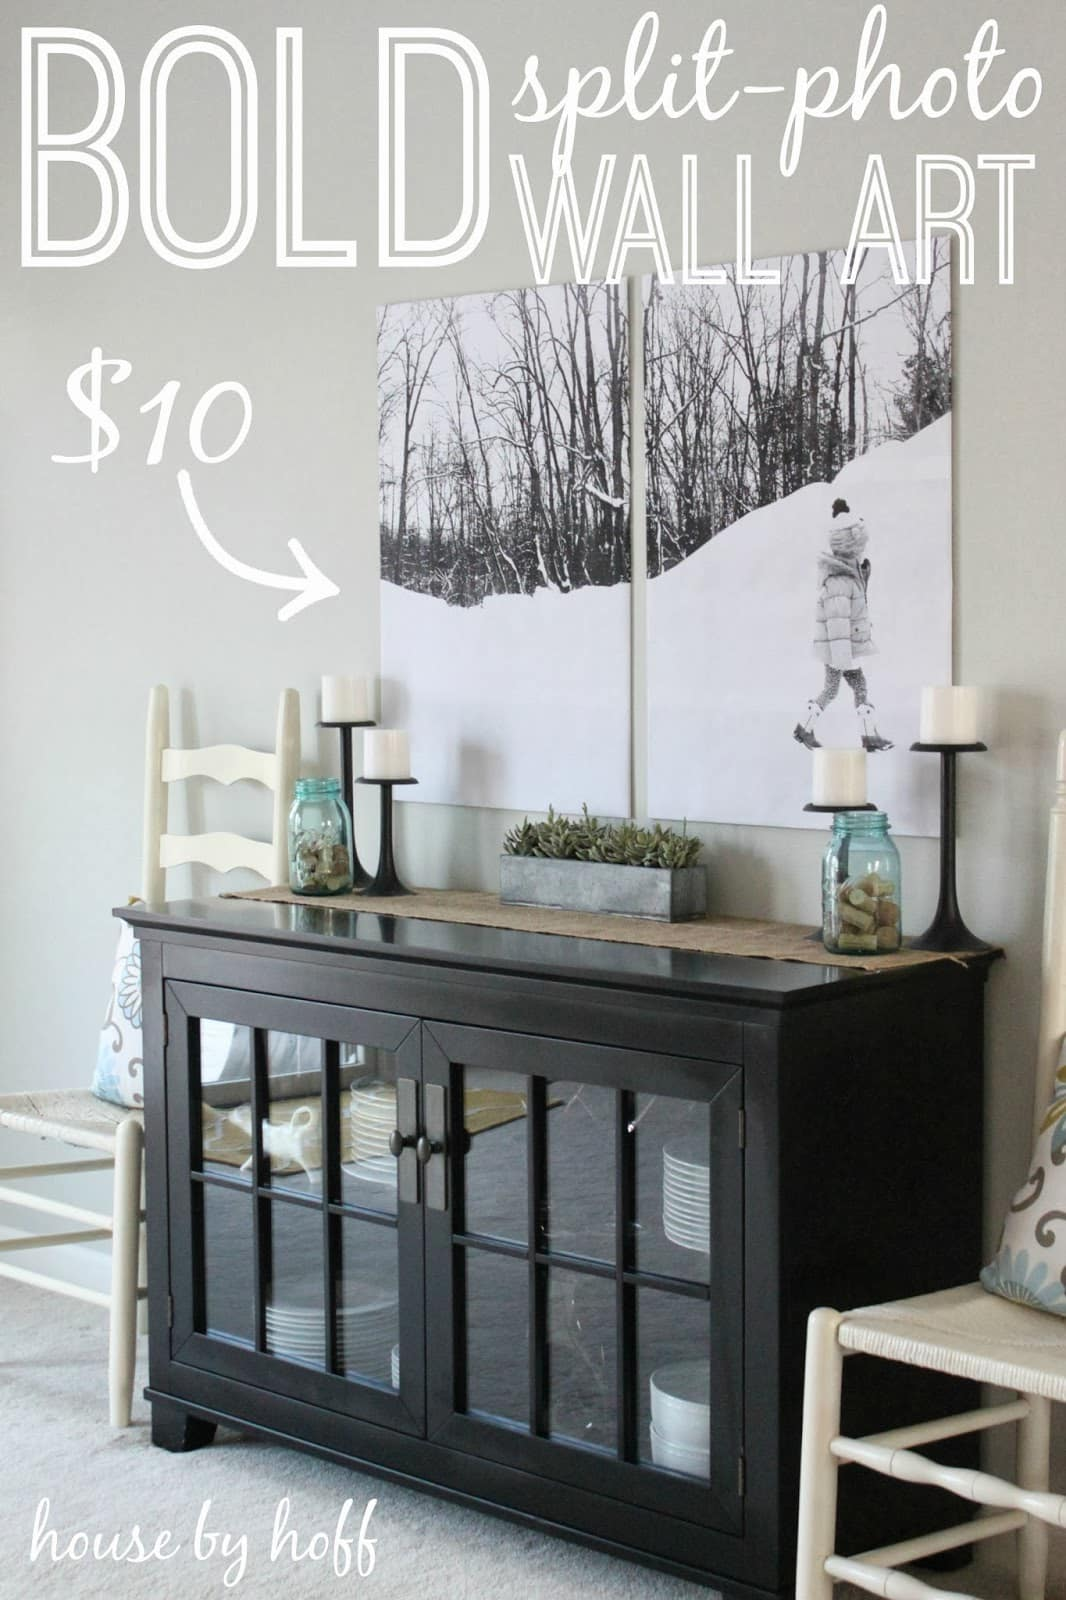 100+ Fun and Creative DIY Wall Art Ideas -Design Bump on Creative:kqmwrvdqiag= Wall Art Ideas  id=23438